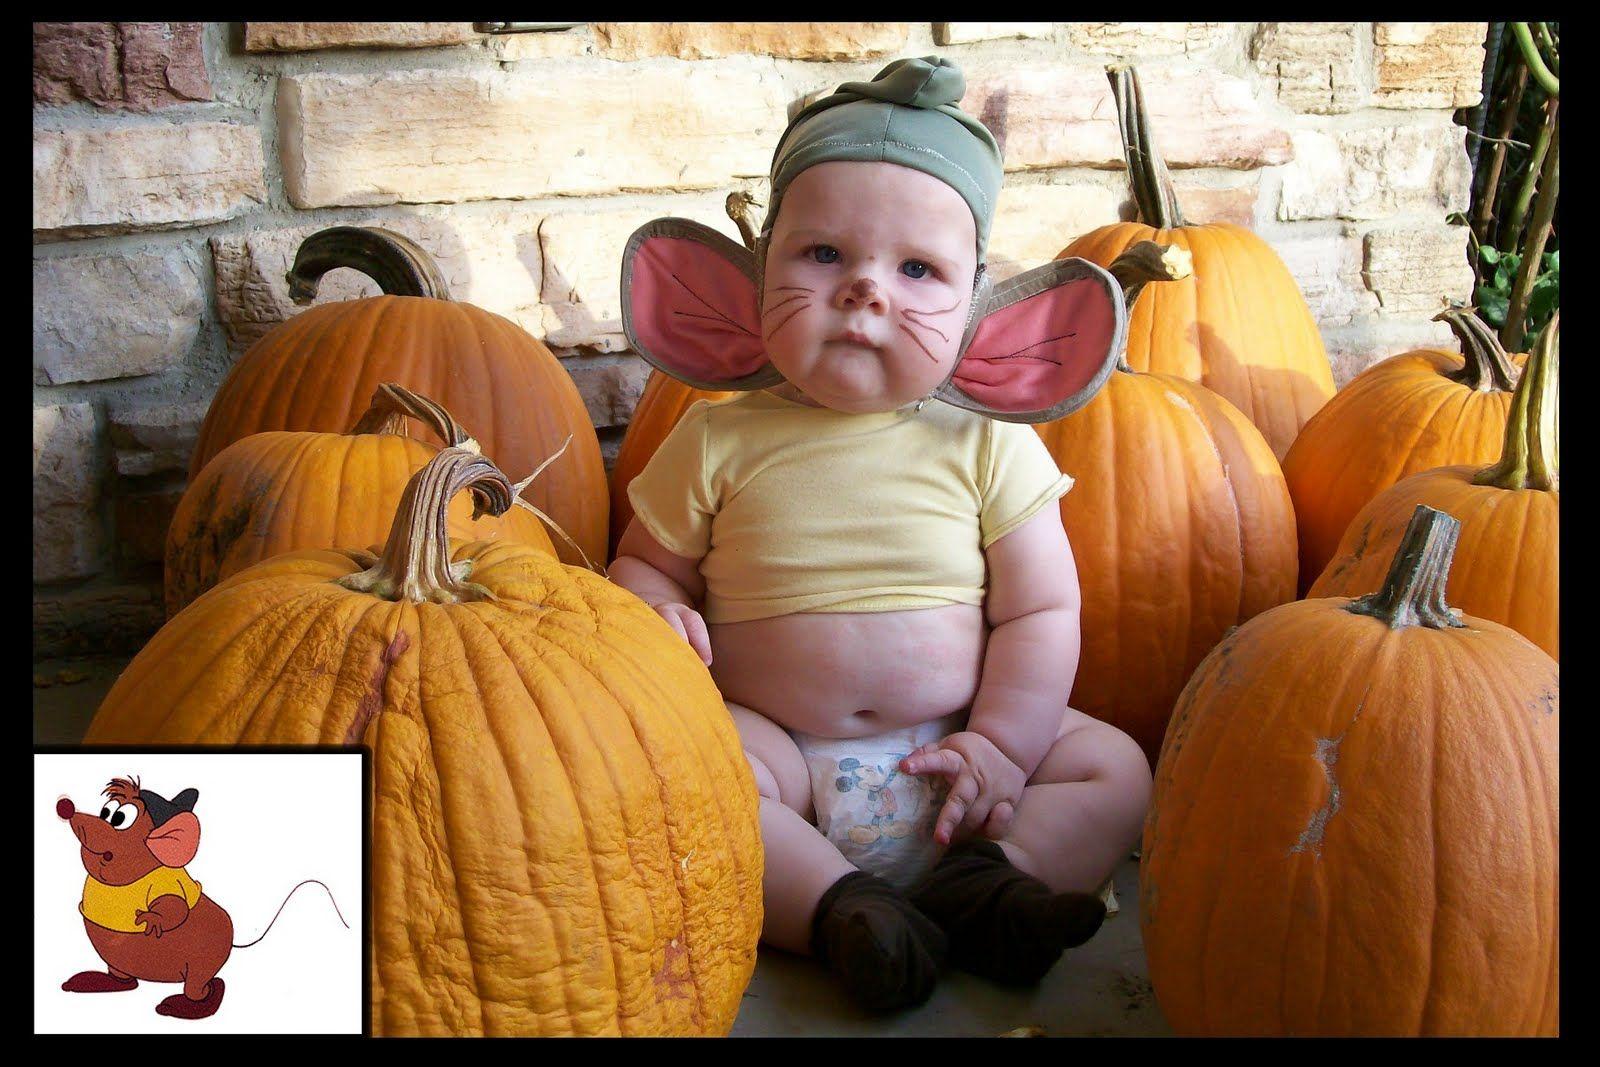 Chubby Baby Halloween Costumes.Pin On Holidays Halloween